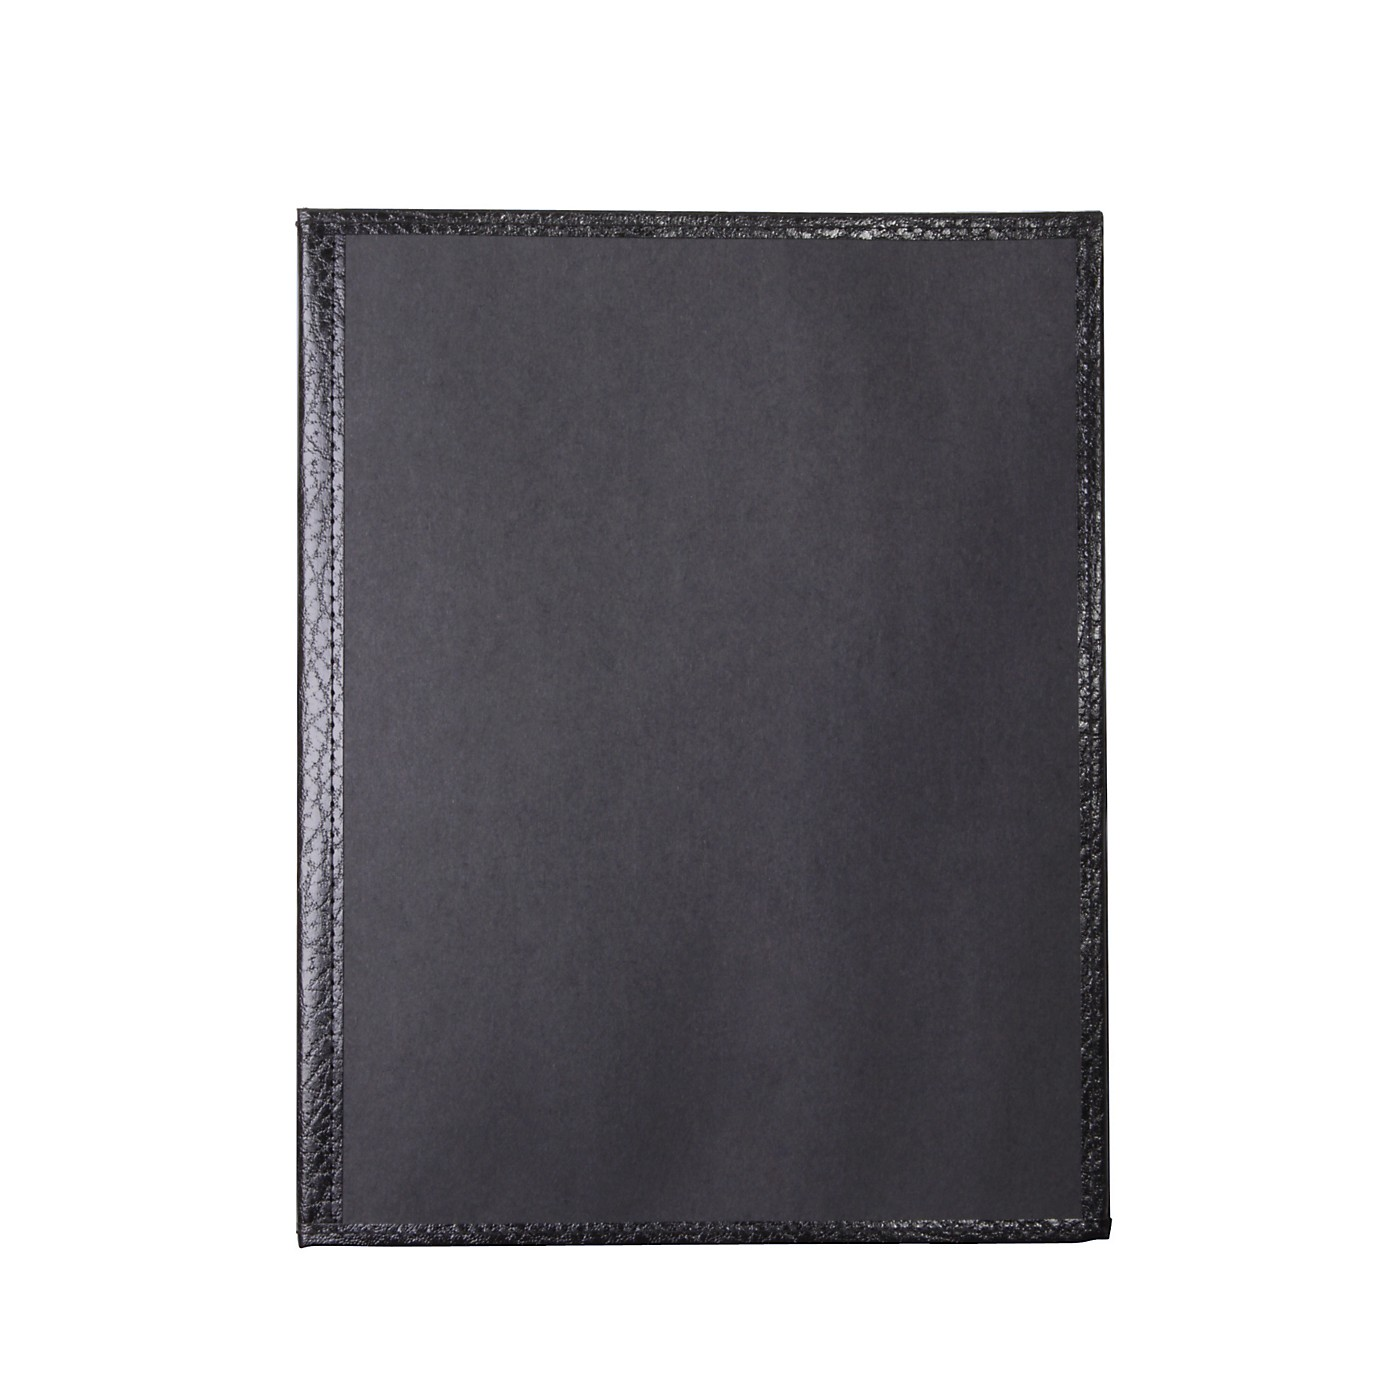 Deer River Choral Economy Folder with Bottom Pocket thumbnail